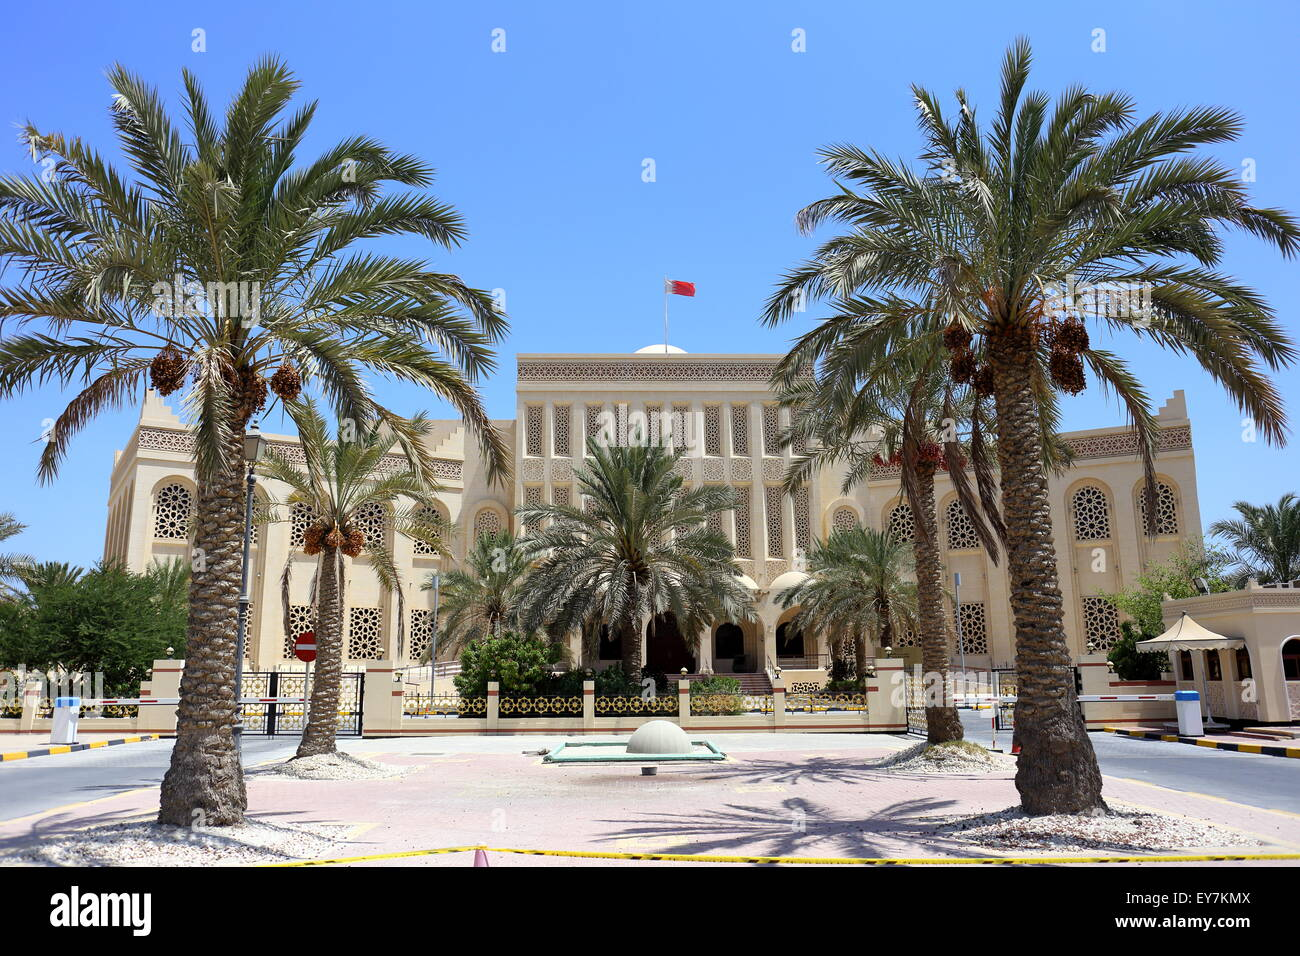 Bibliothèque de la mosquée Al-Fatih (Grand), Edimbourg, Royaume de Bahreïn Photo Stock